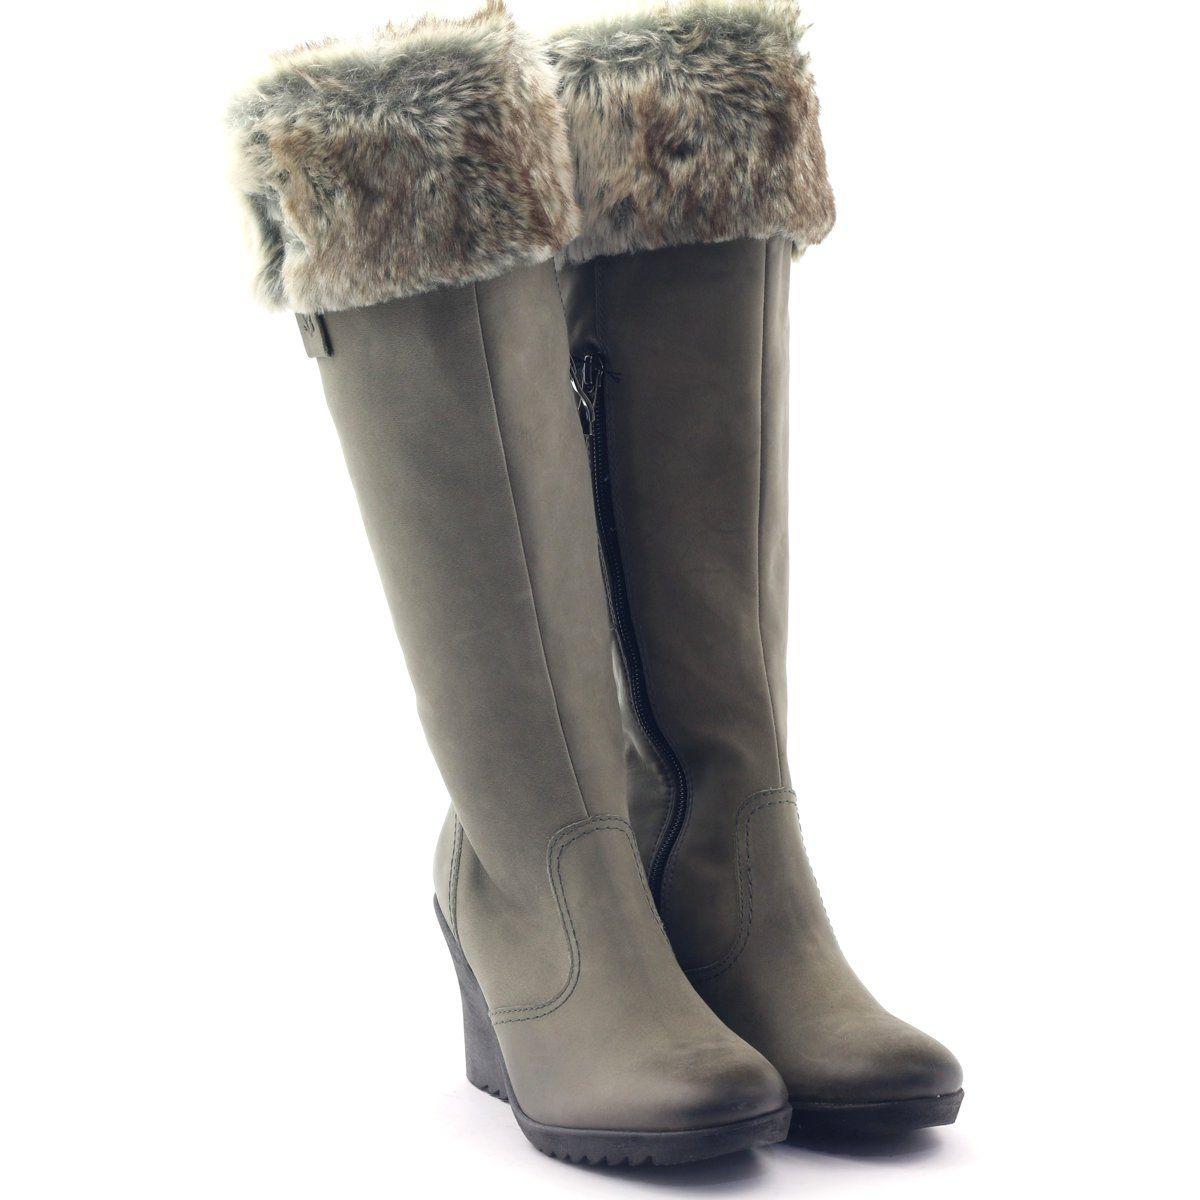 Caprice Kozaki Buty Damskie Skorzane 25607 Szare Womens Boots Leather Women Boots